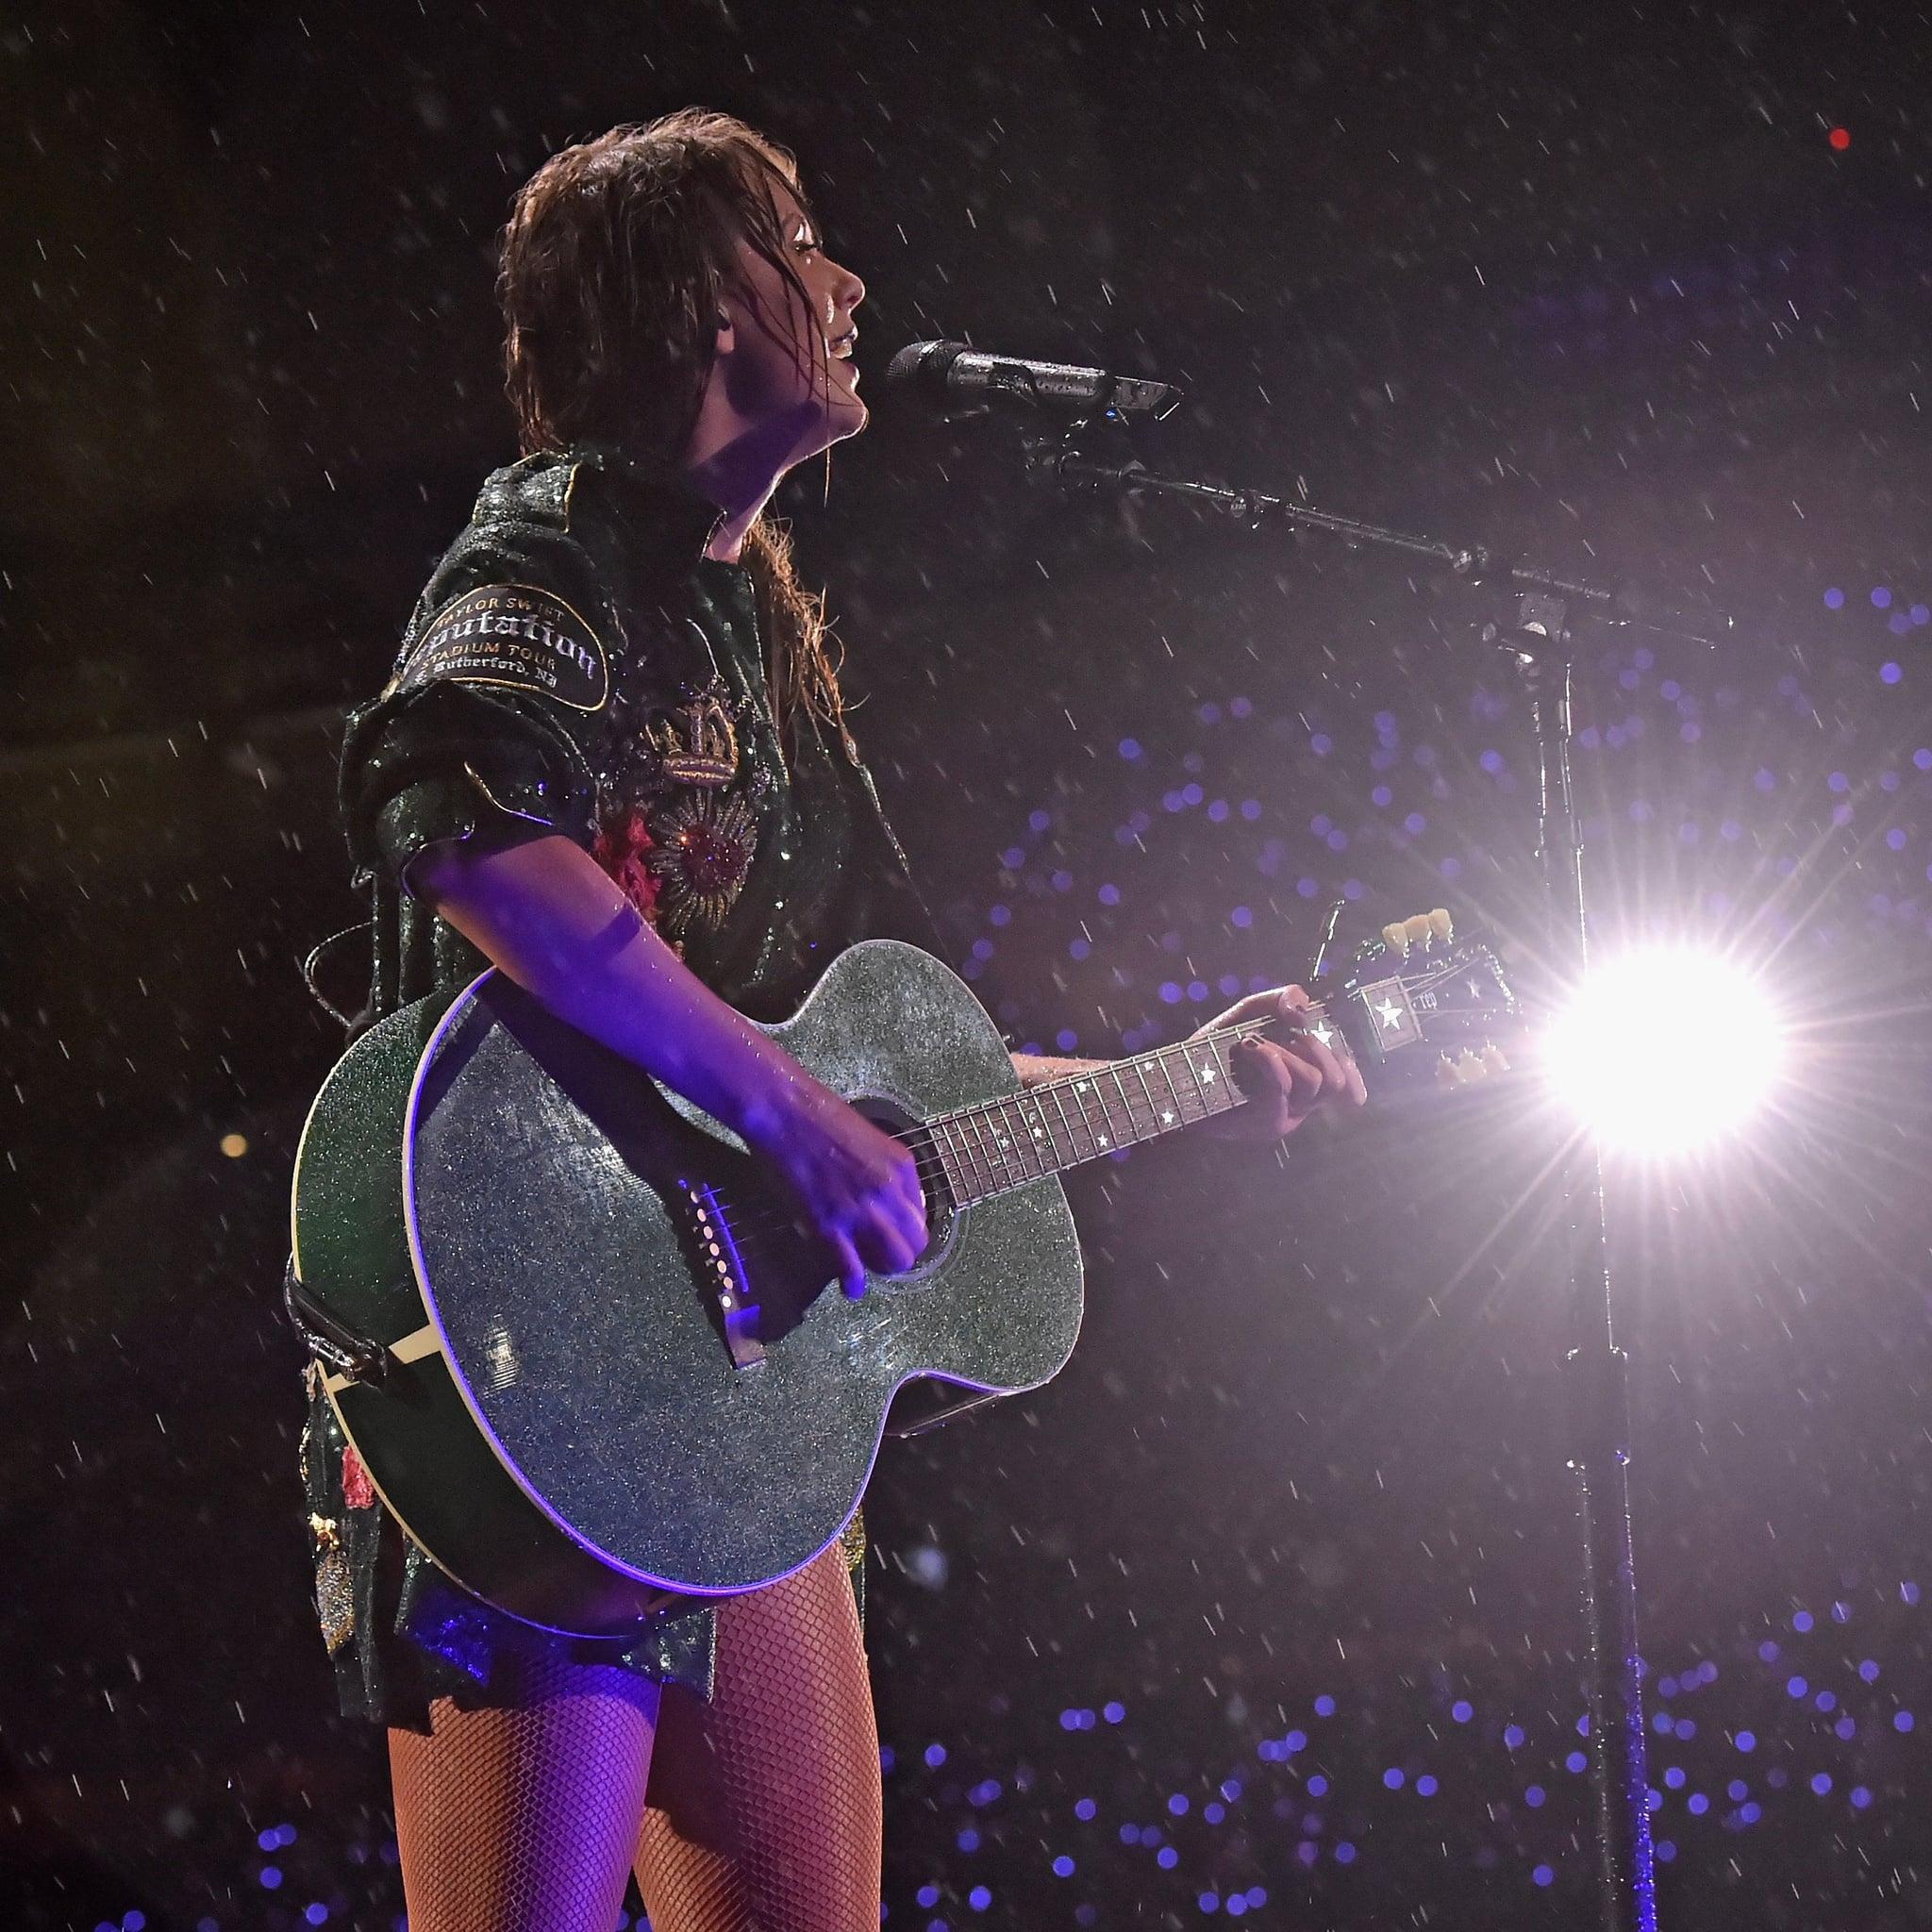 Taylor Swift Reputation Concert In The Rain Photos Popsugar Celebrity